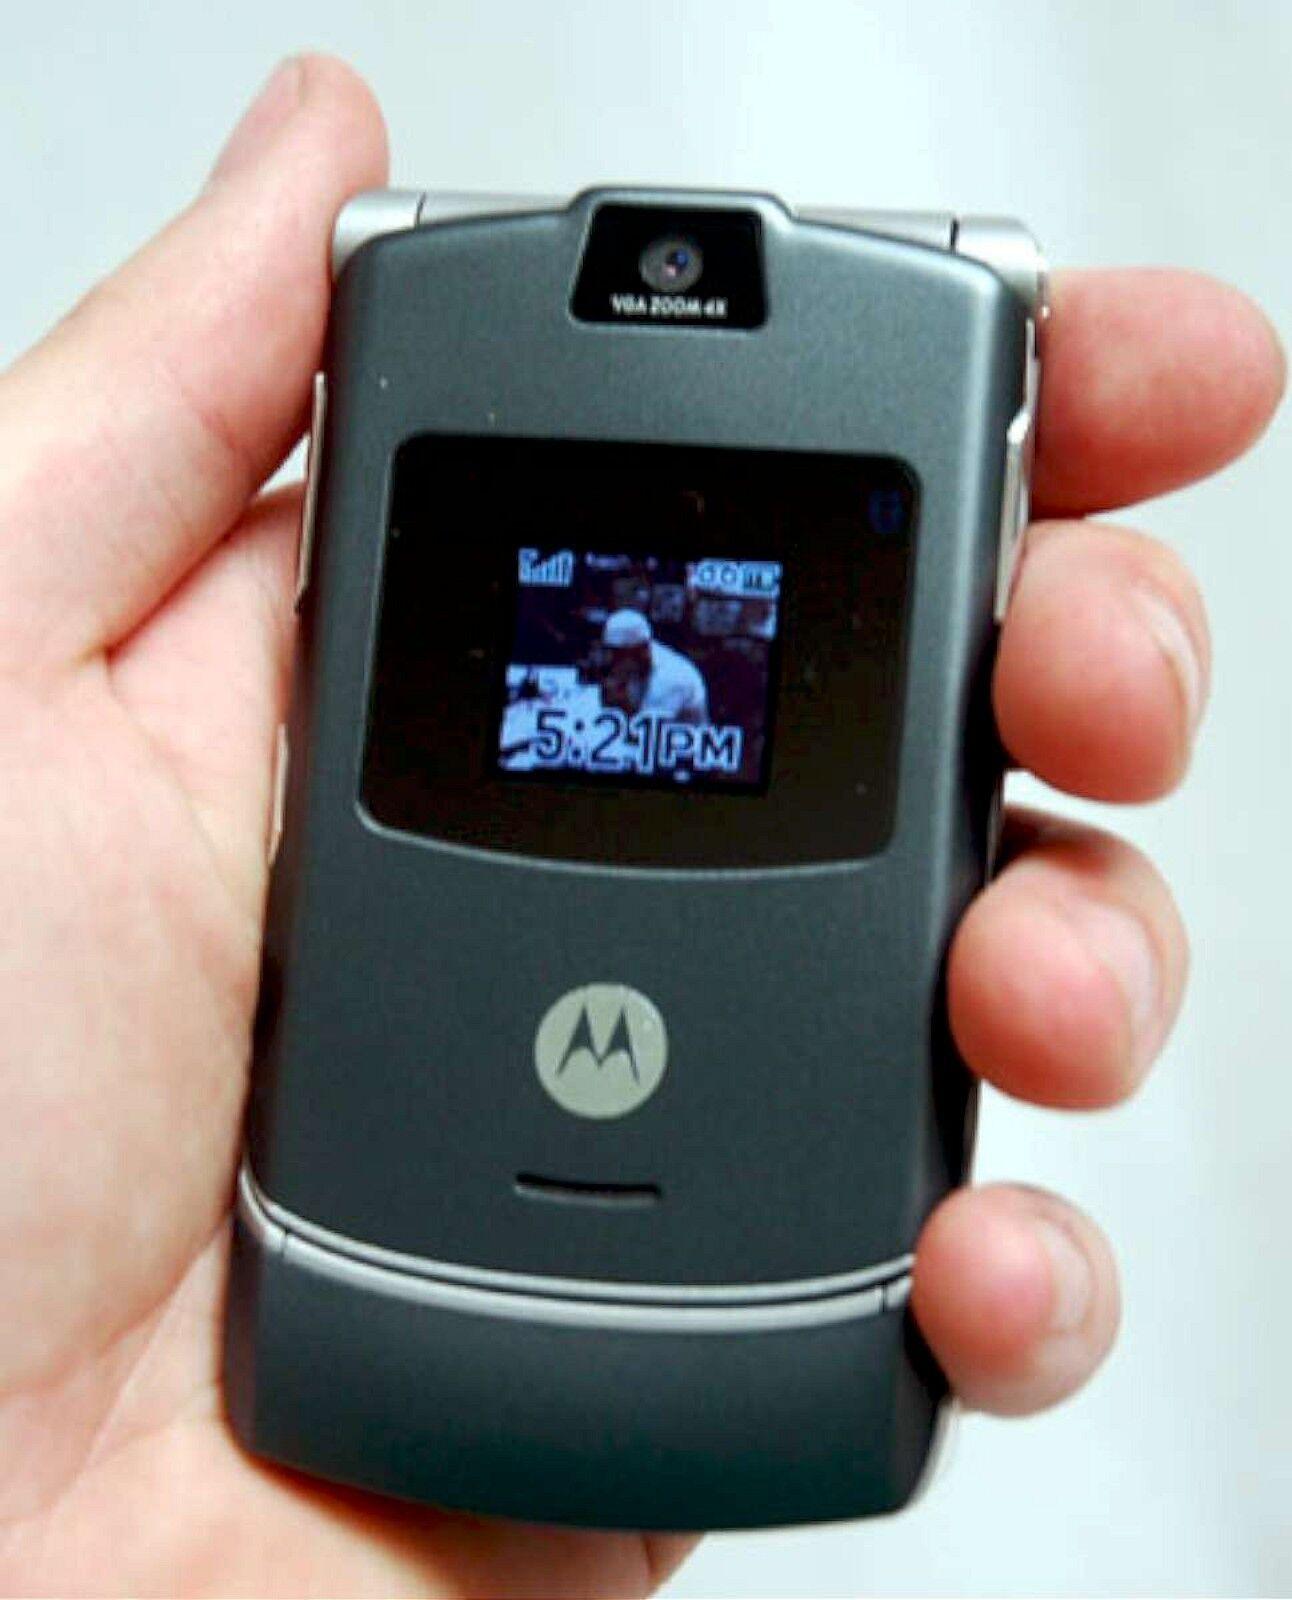 motorola razr v3c verizon cell phone v3 razor dark grey flip camera rh ebay com motorola razr v3 manual at&t motorola v3 razr manual